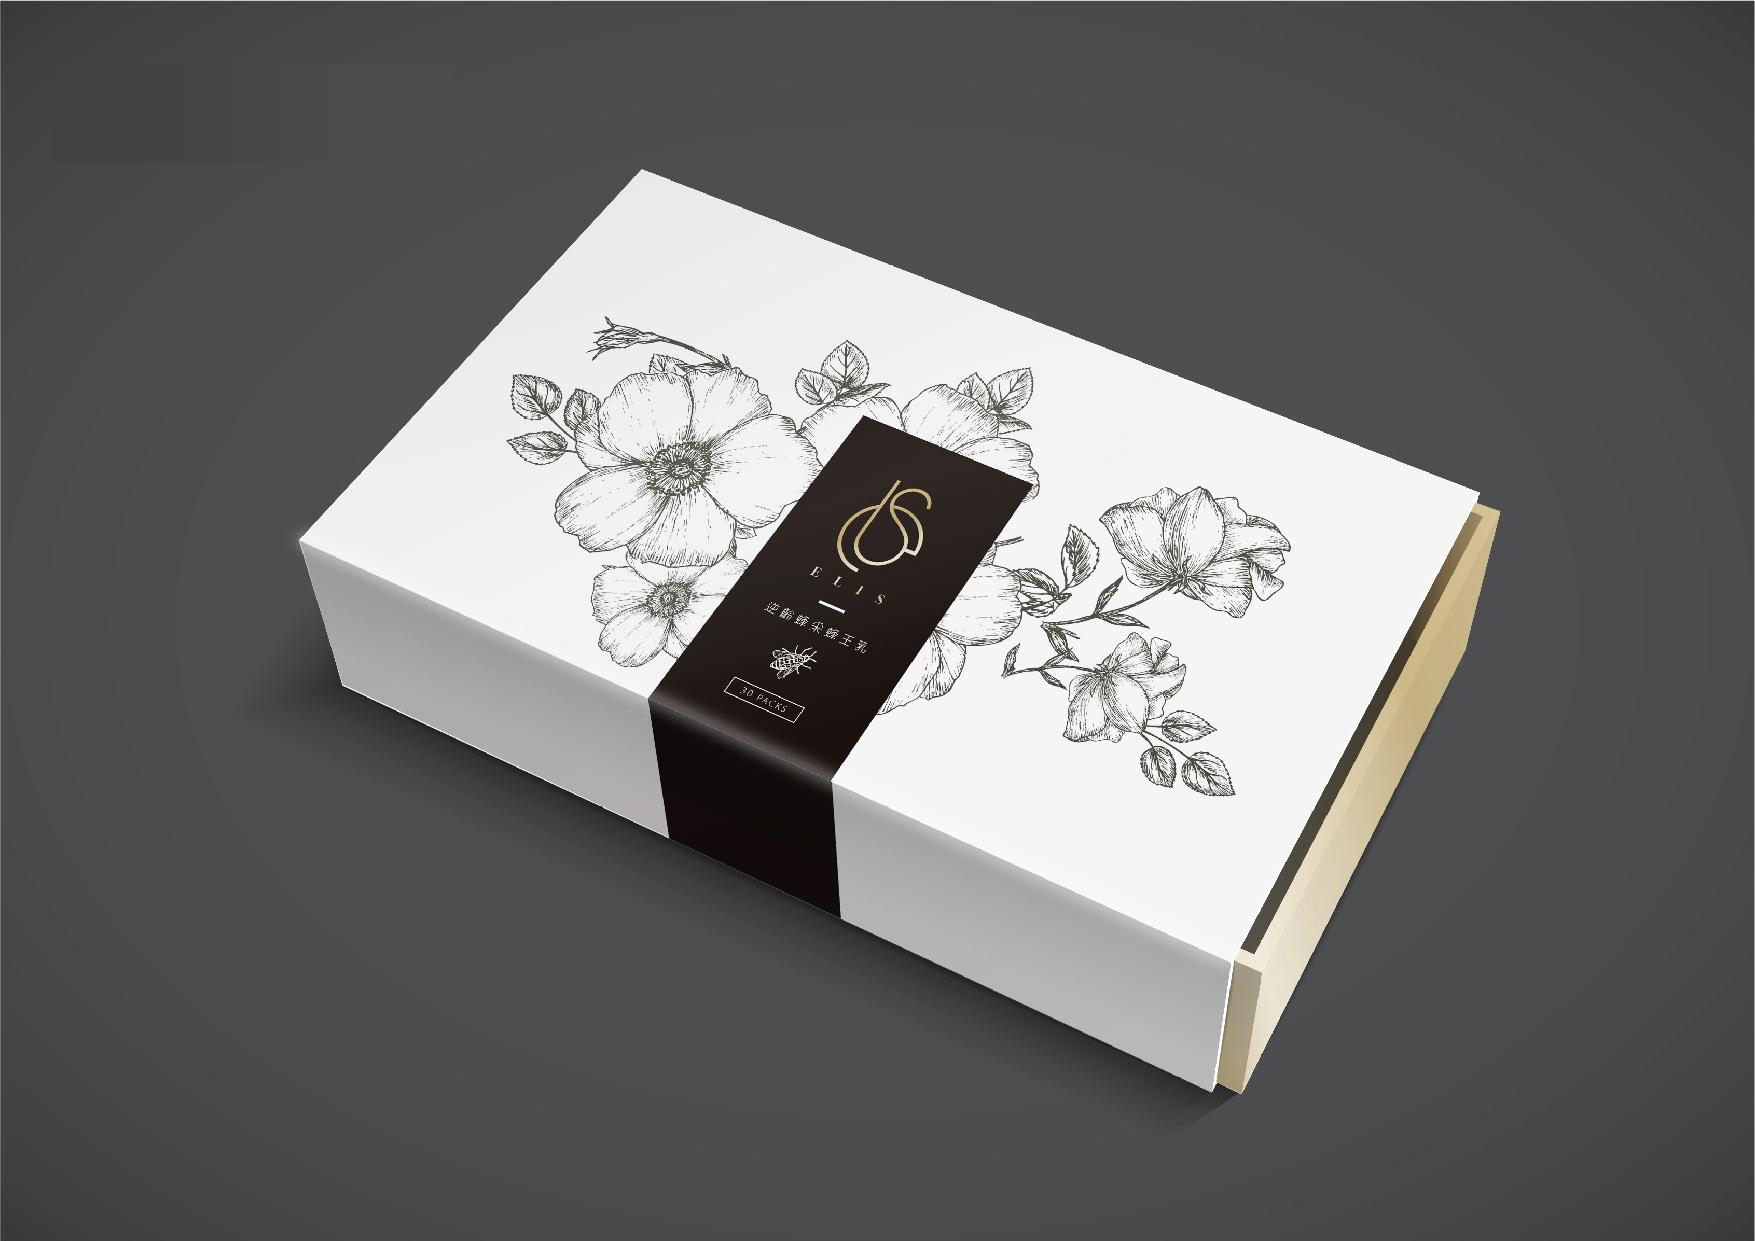 LOGO設計 | 企業CIS規劃 | 品牌形象規劃 | 約瑟夫整合行銷設計